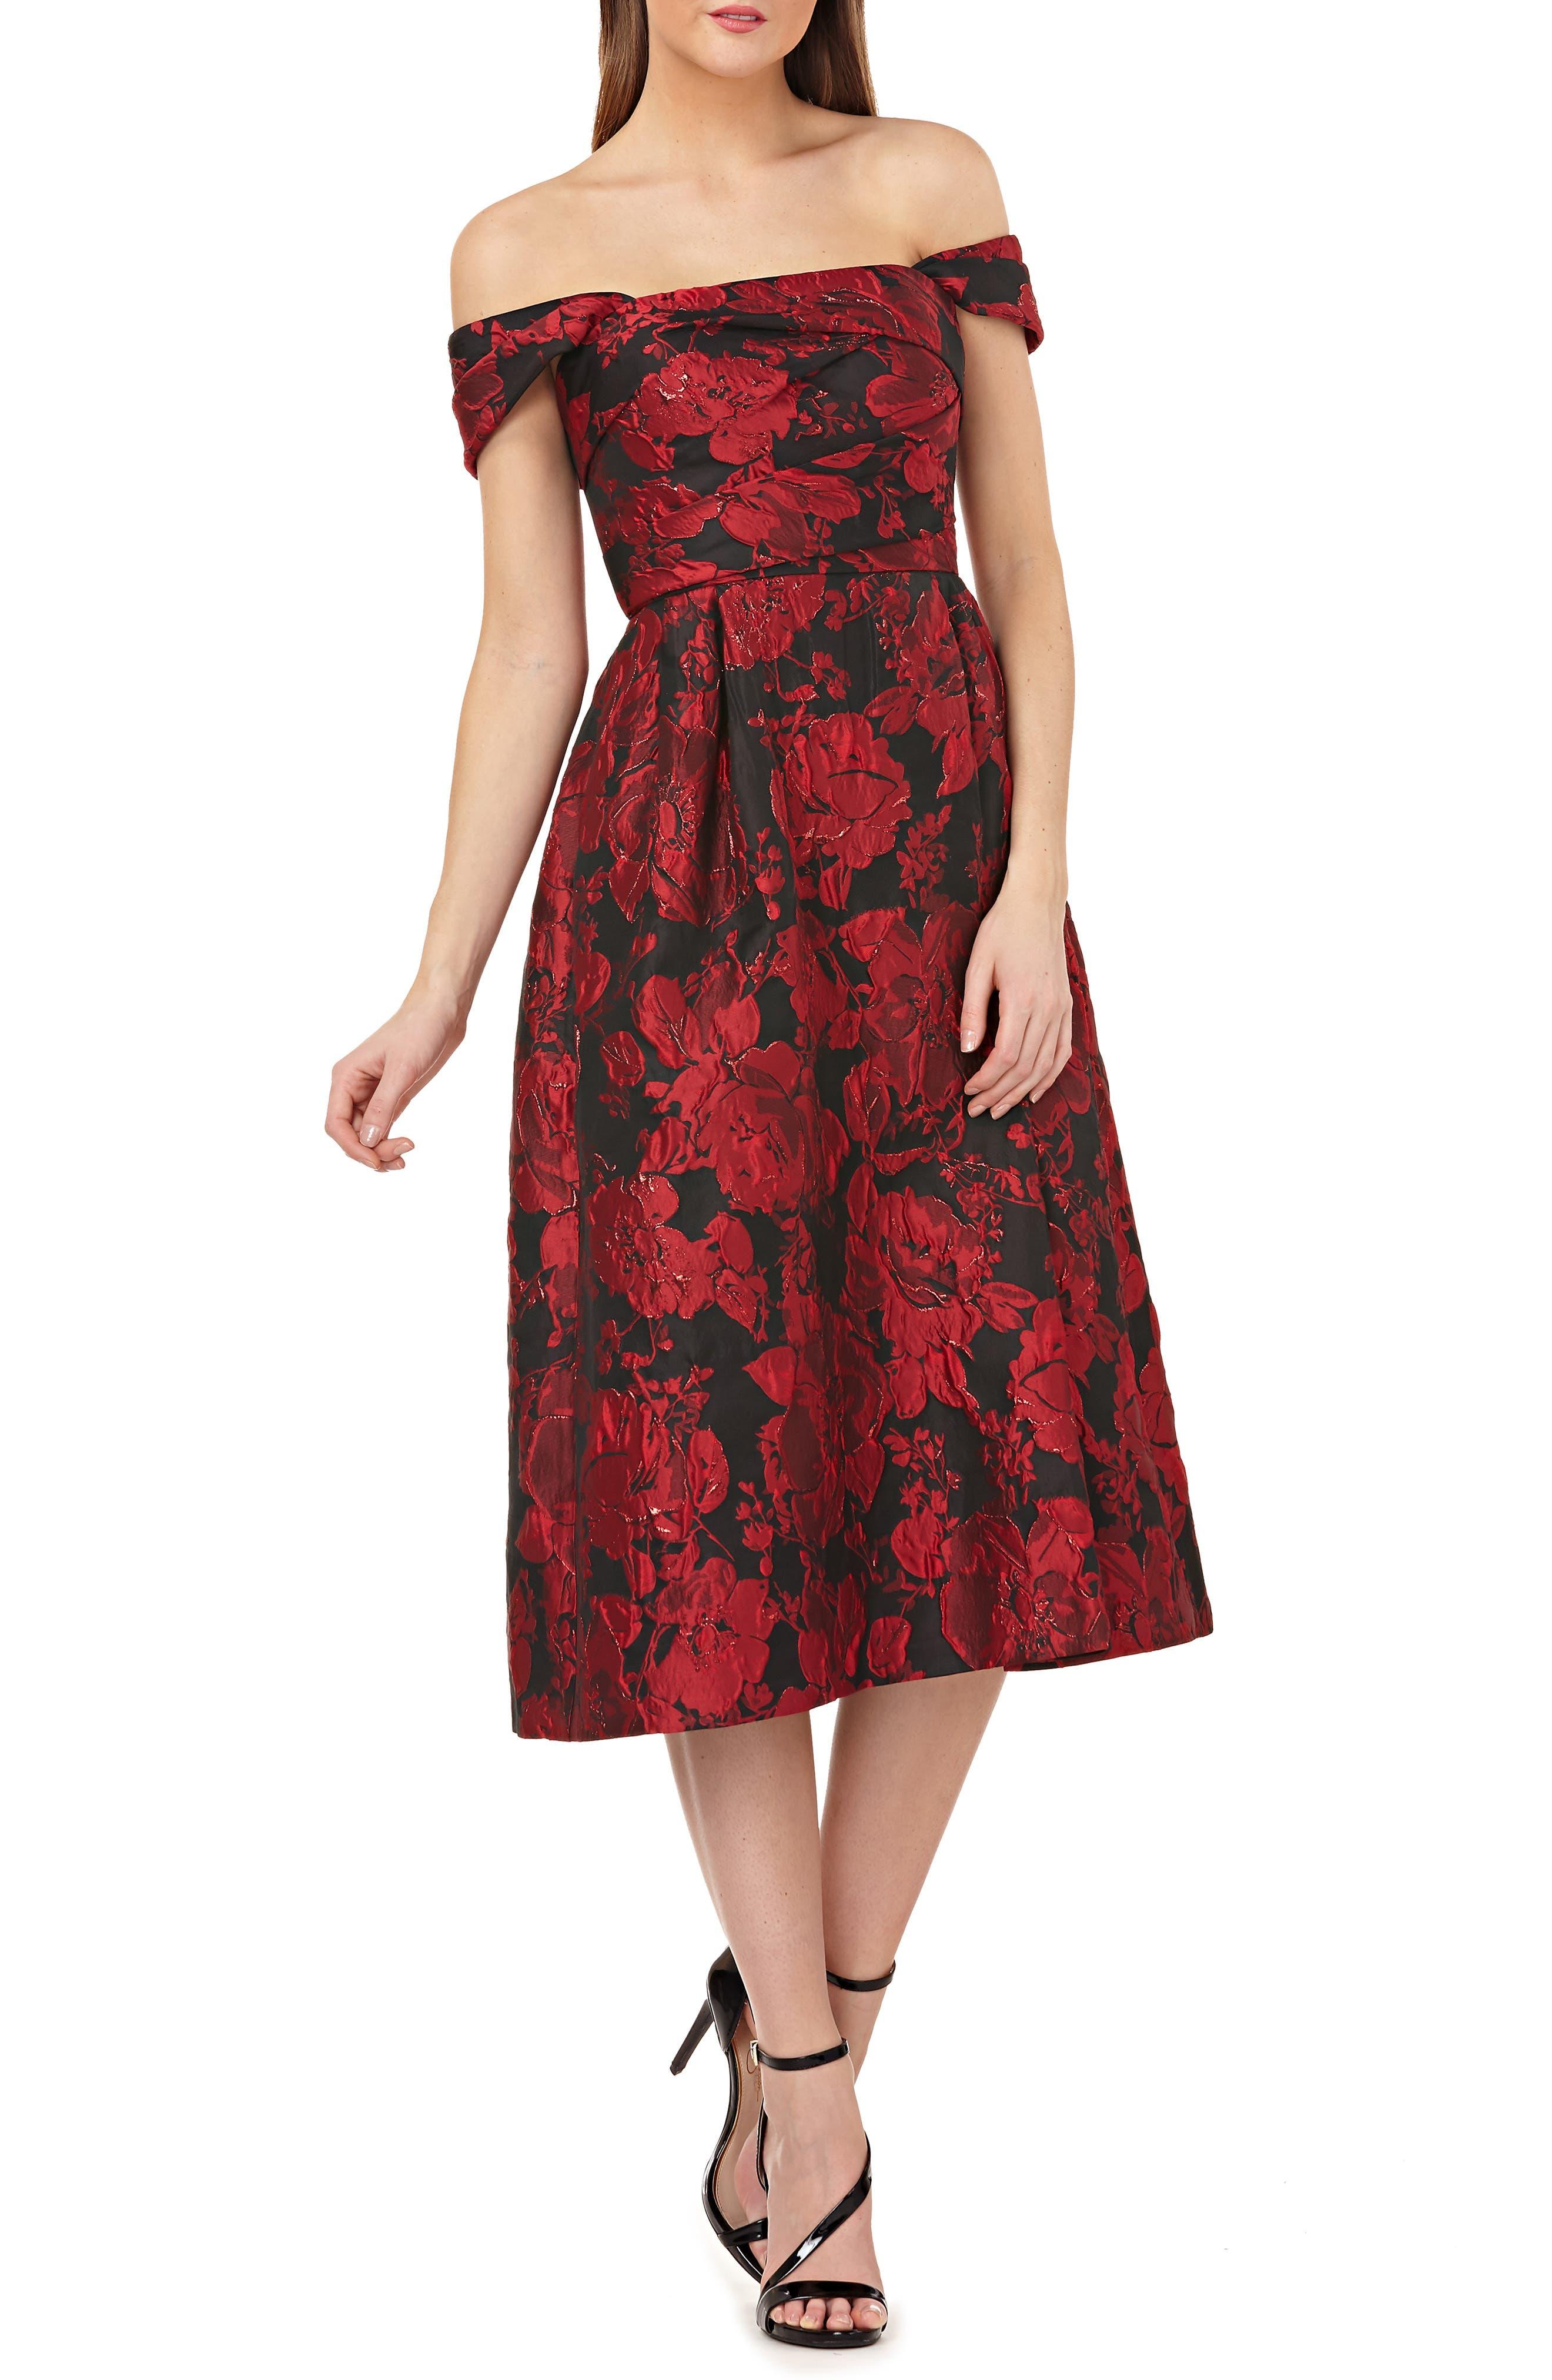 CARMEN MARC VALVO INFUSION Floral Brocade Off-The-Shoulder A-Line Dress in Red/Black